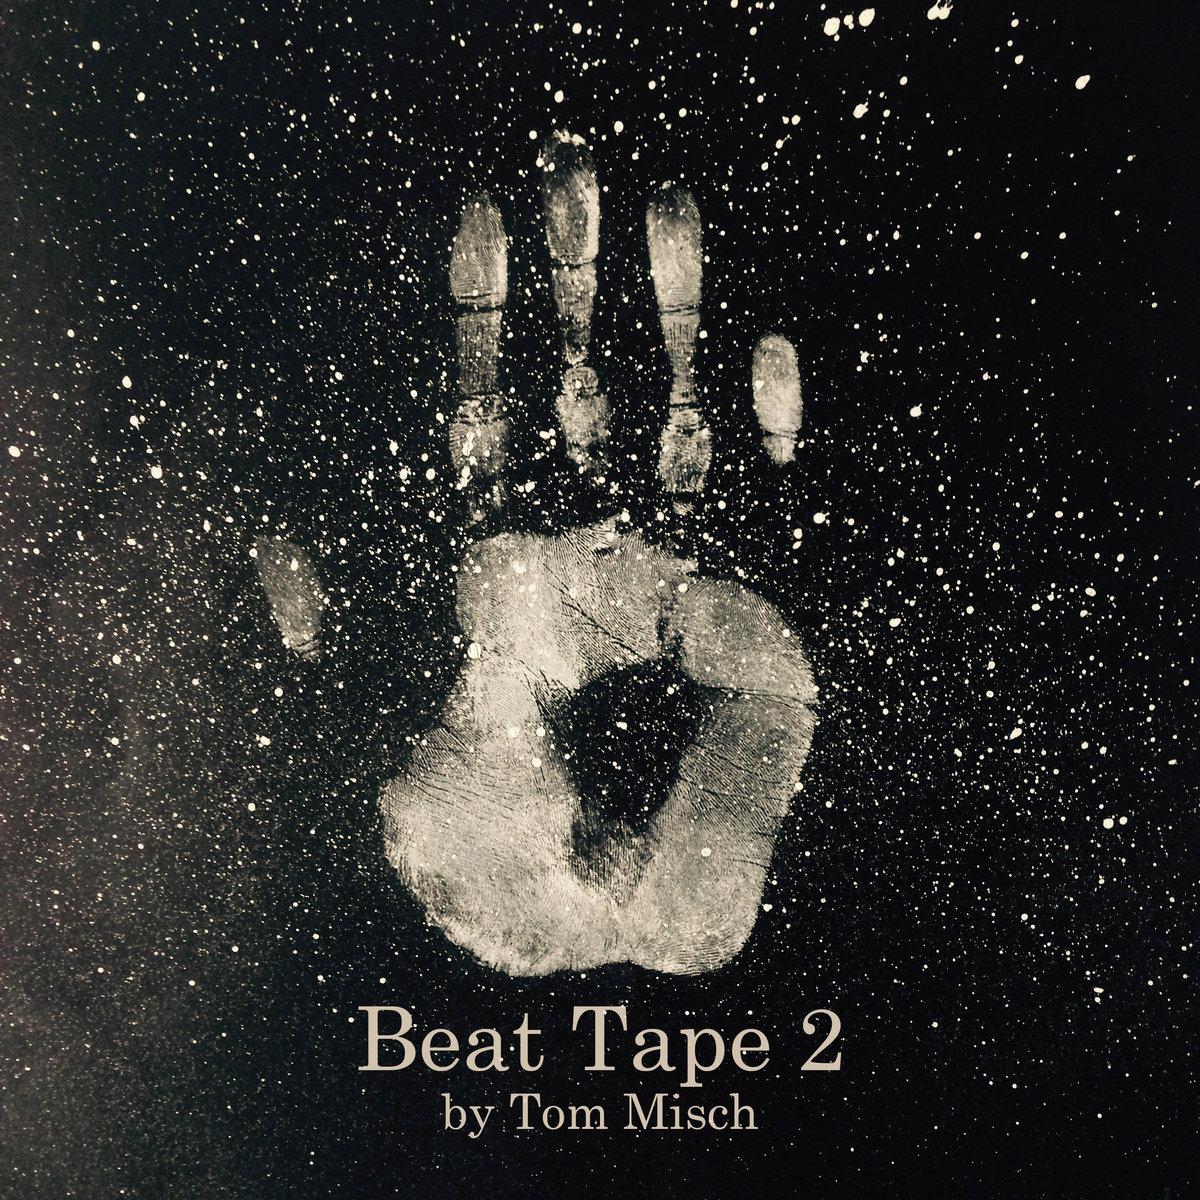 Beat Tape 2 by Tom Misch